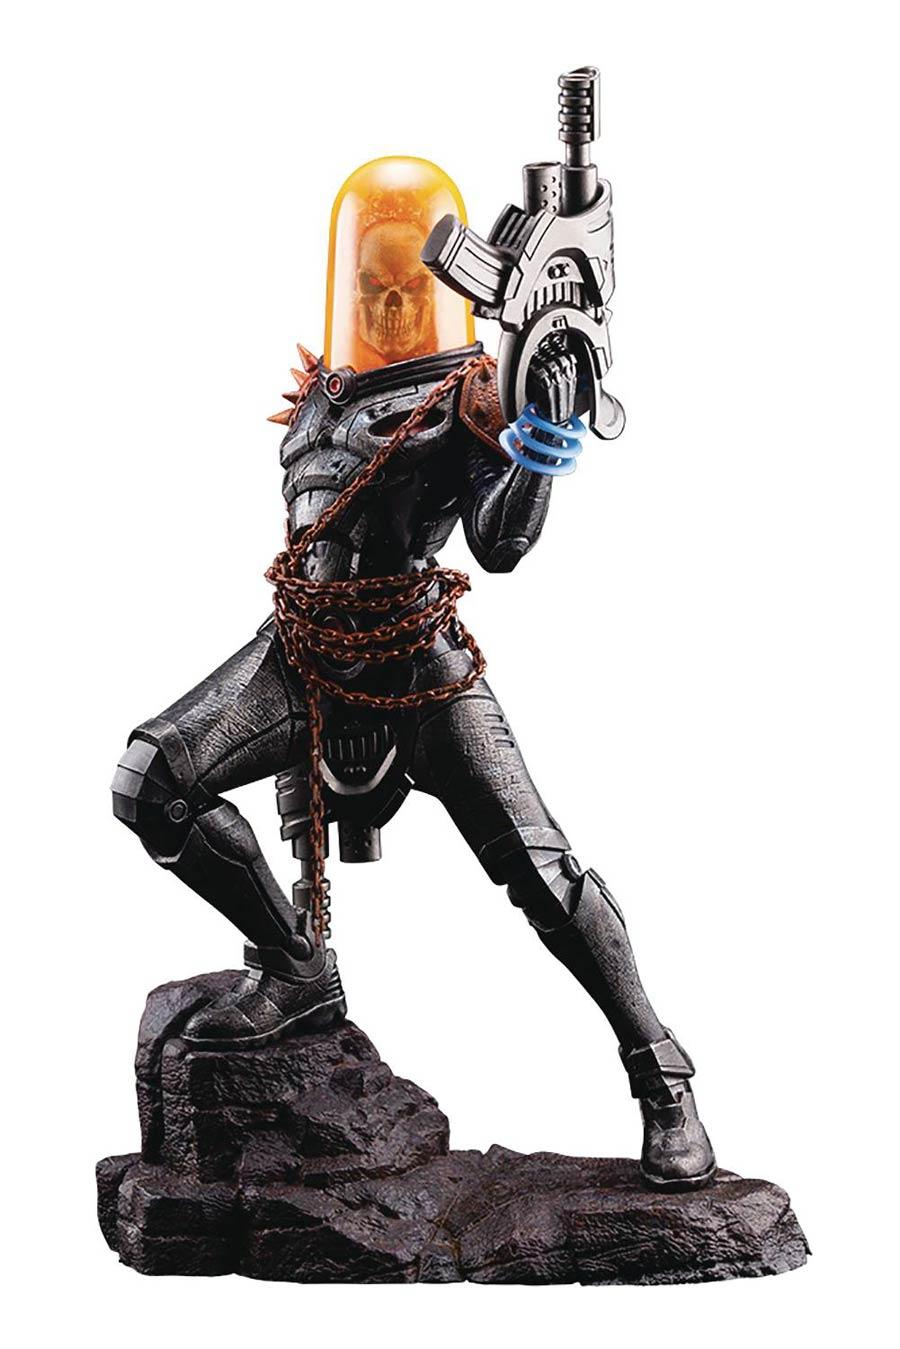 Marvel Cosmic Ghost Rider ARTFX Premier Statue